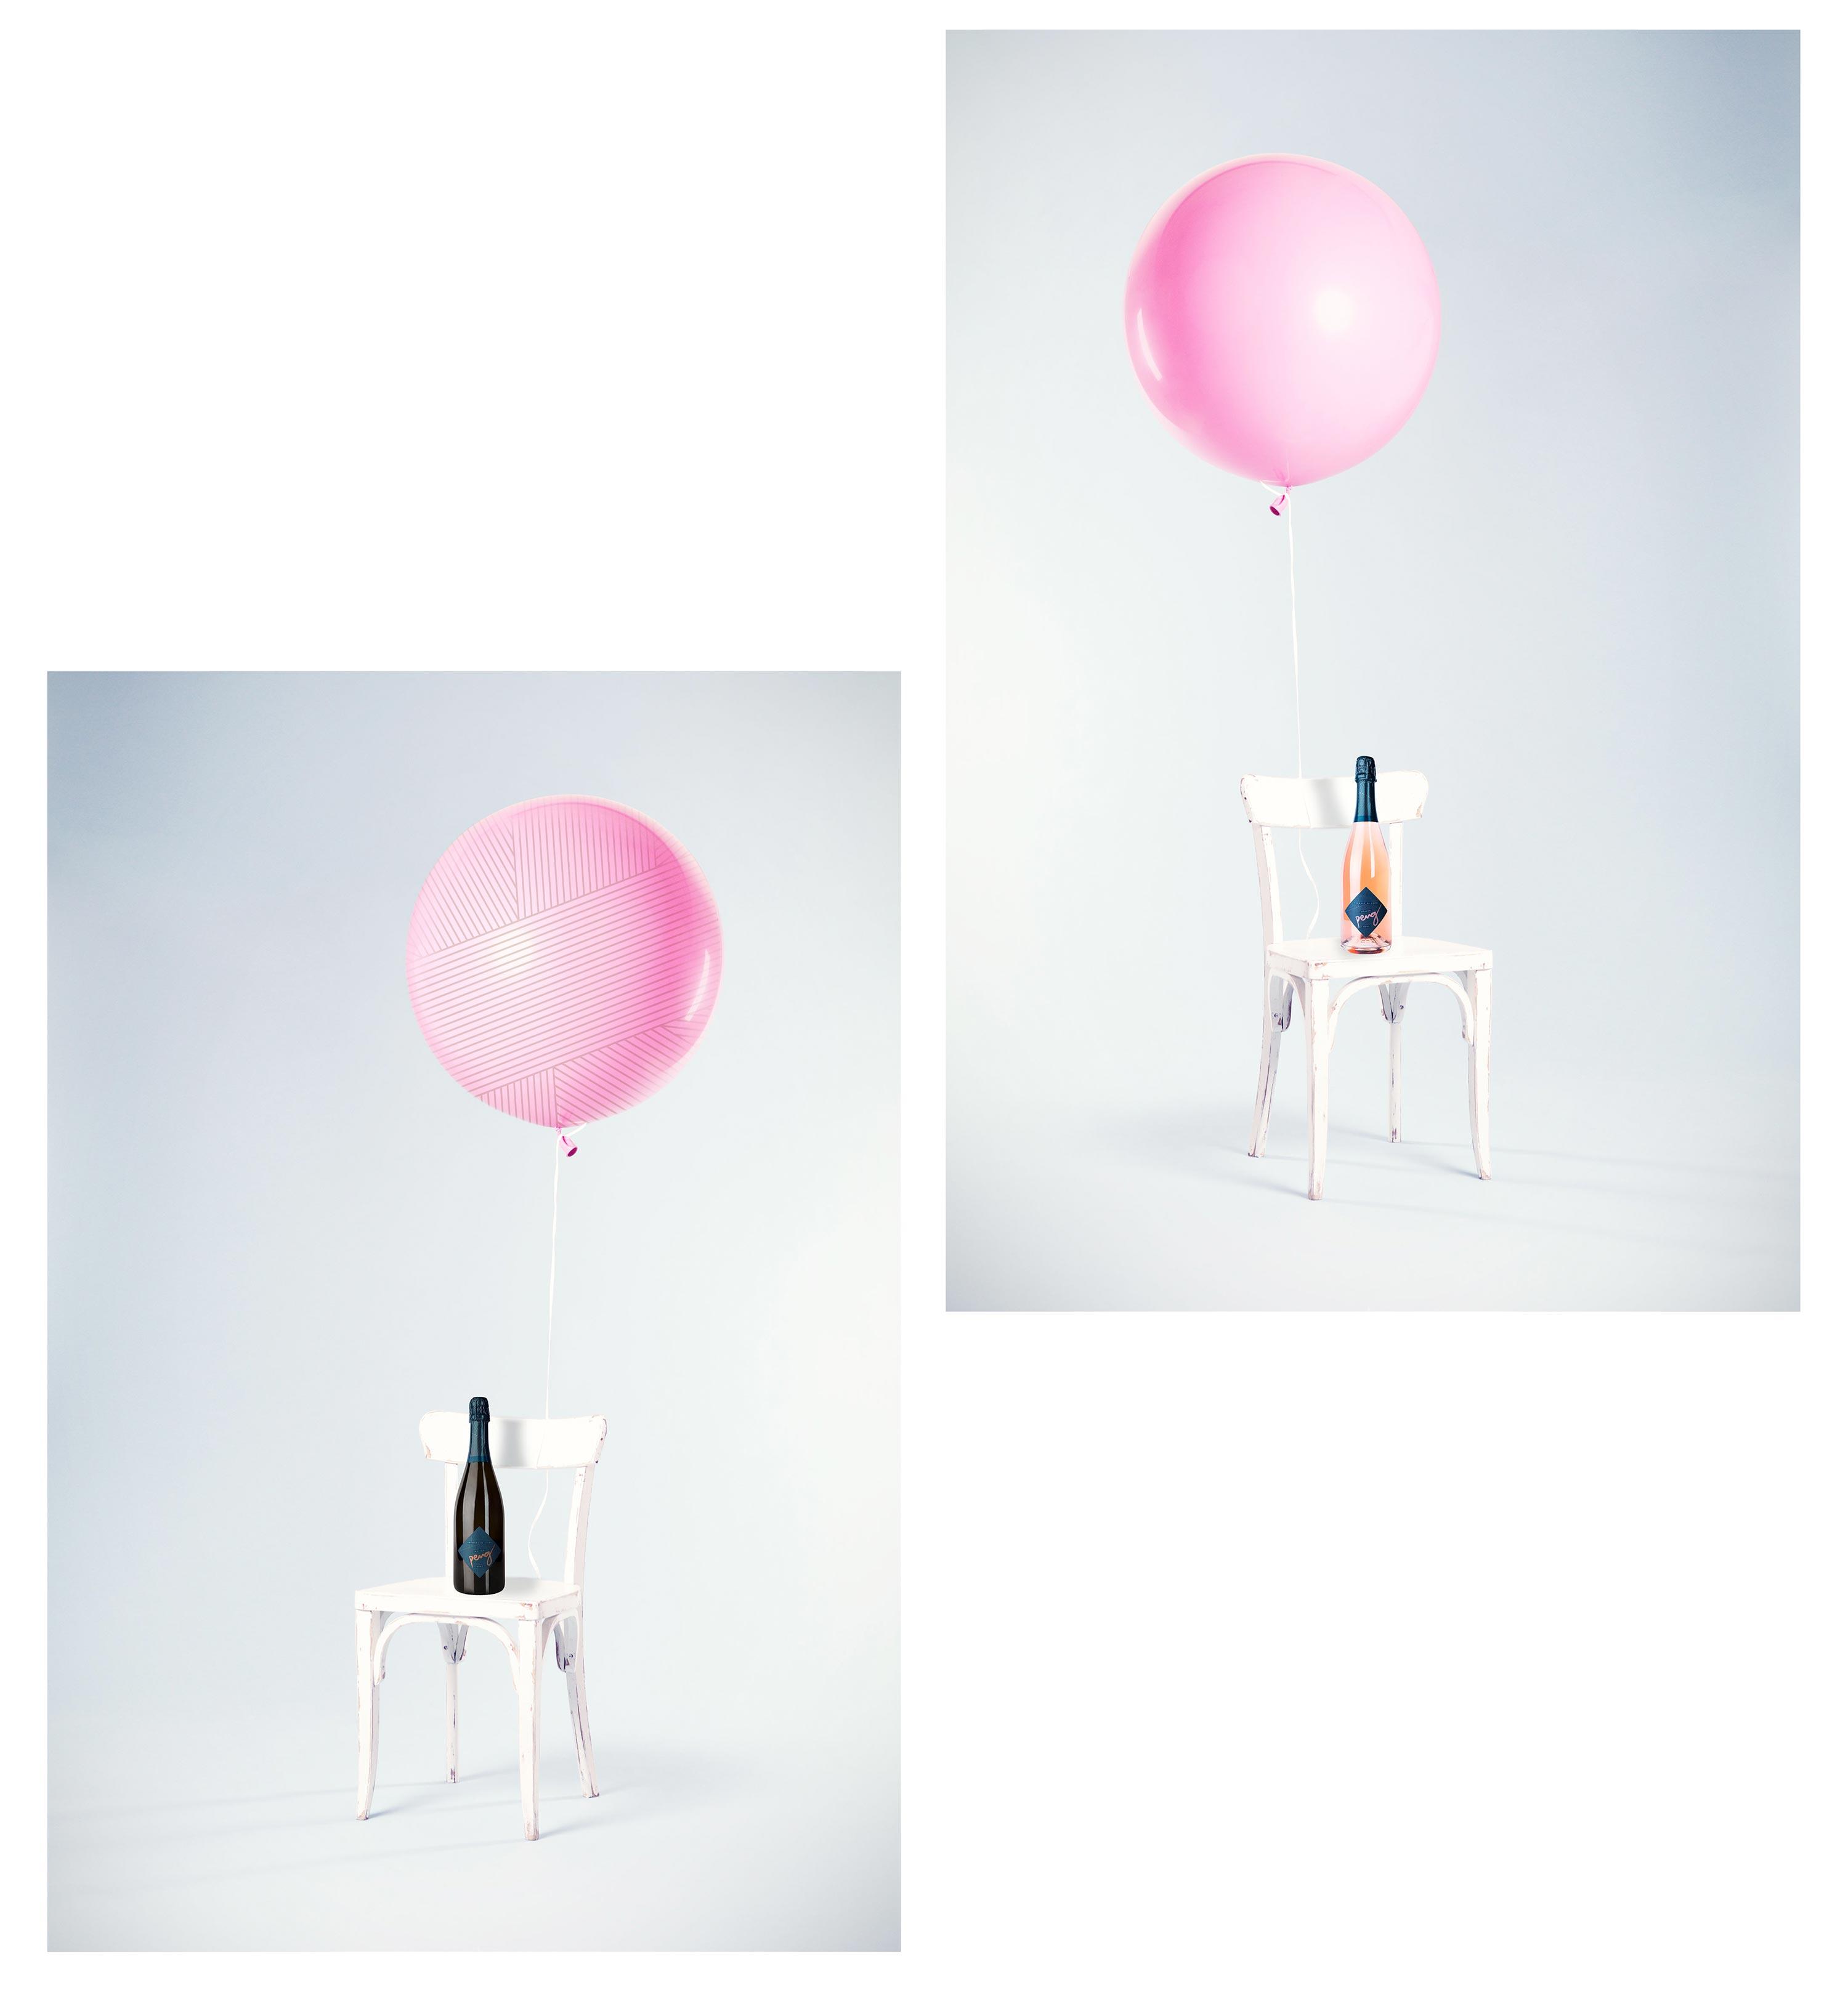 06-maison-peng-cremant-de-loire-brut-rose-packaging-design-label-branding-corporate-design-website-imagery